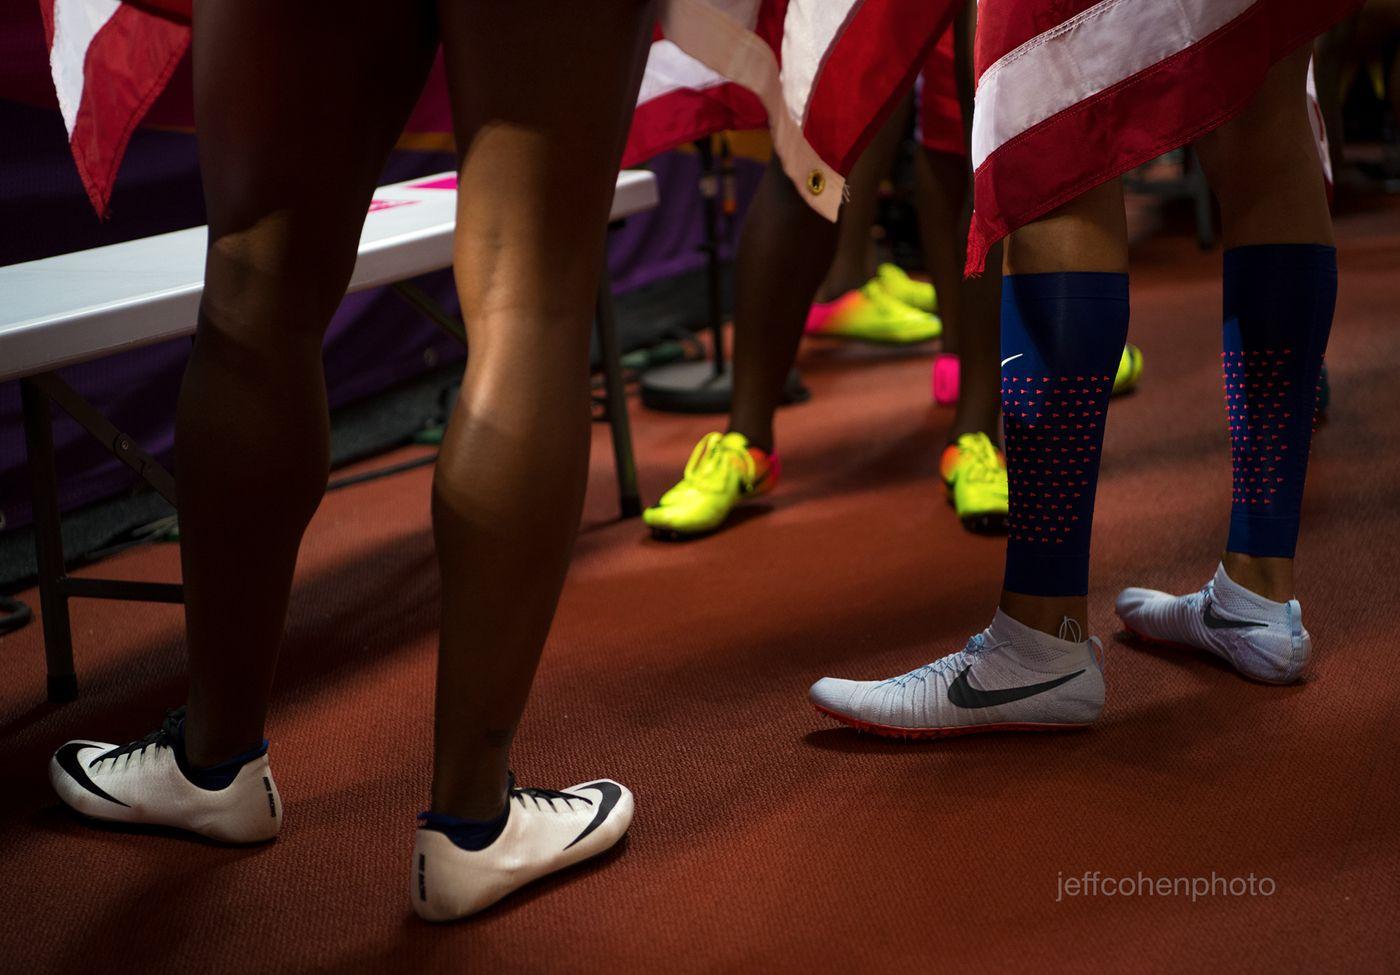 2017-IAAF-WC-London-night-9--4x1w-spikes-flags-4281--jeff-cohen-photo--web.jpg